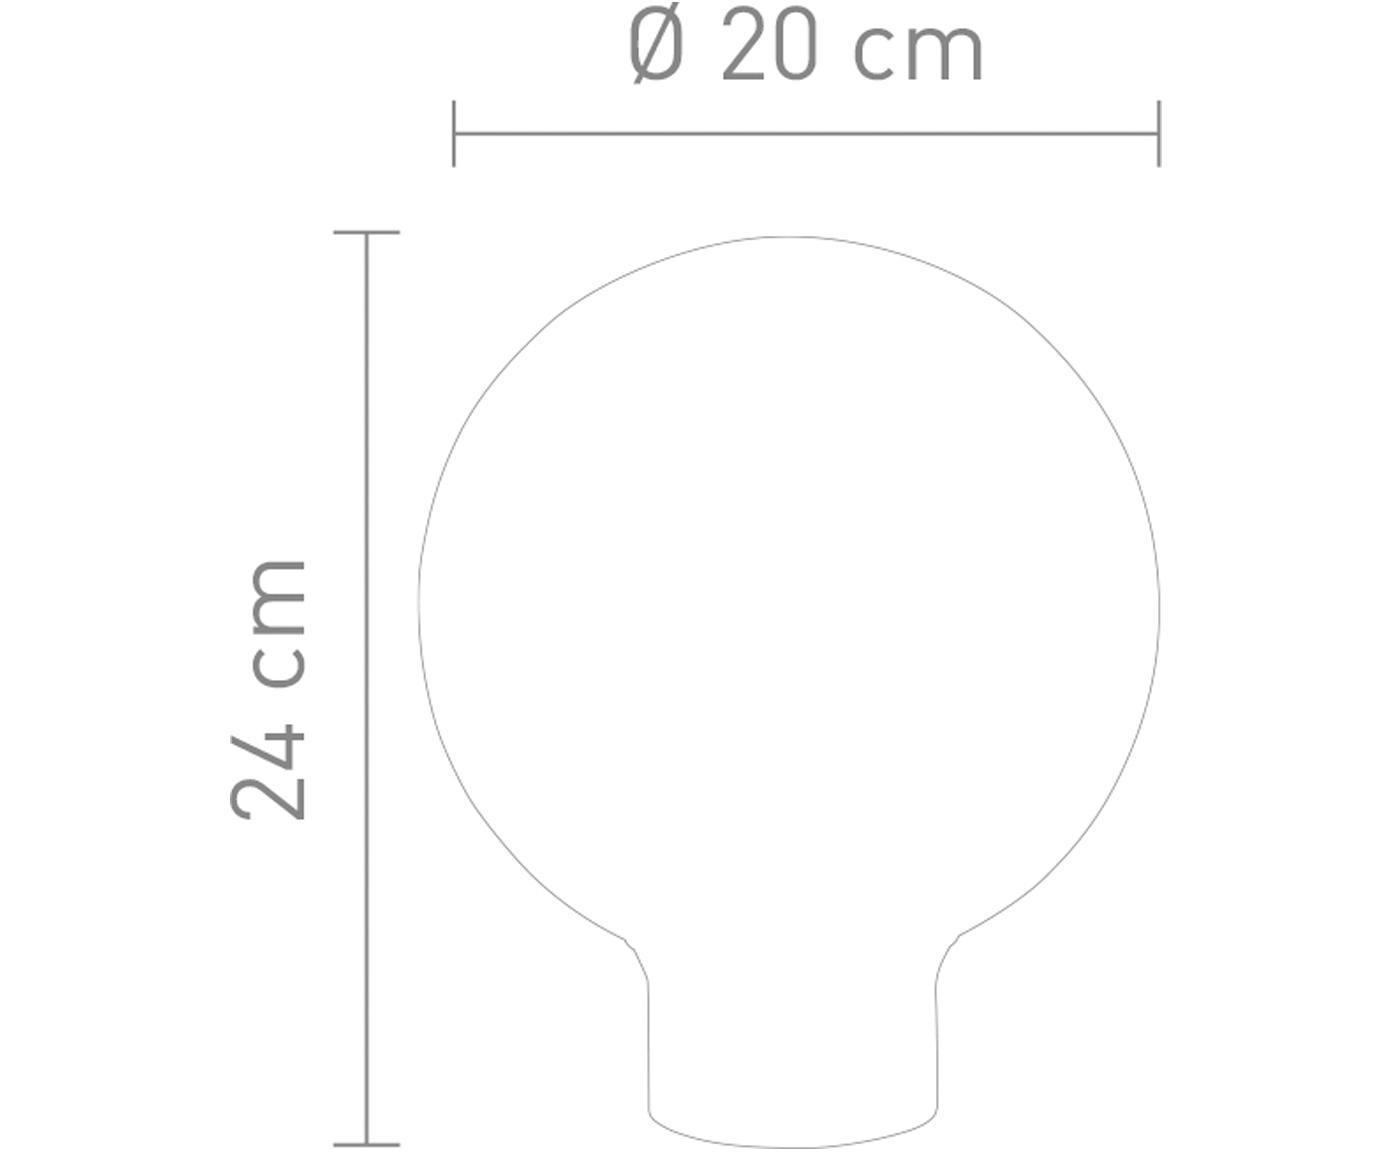 Tafellamp Tokio, Lampenkap: verspiegeld glas, Lampvoet: gesatineerd metaal, Grijs, metaalkleurig, Ø 20 x H 24 cm